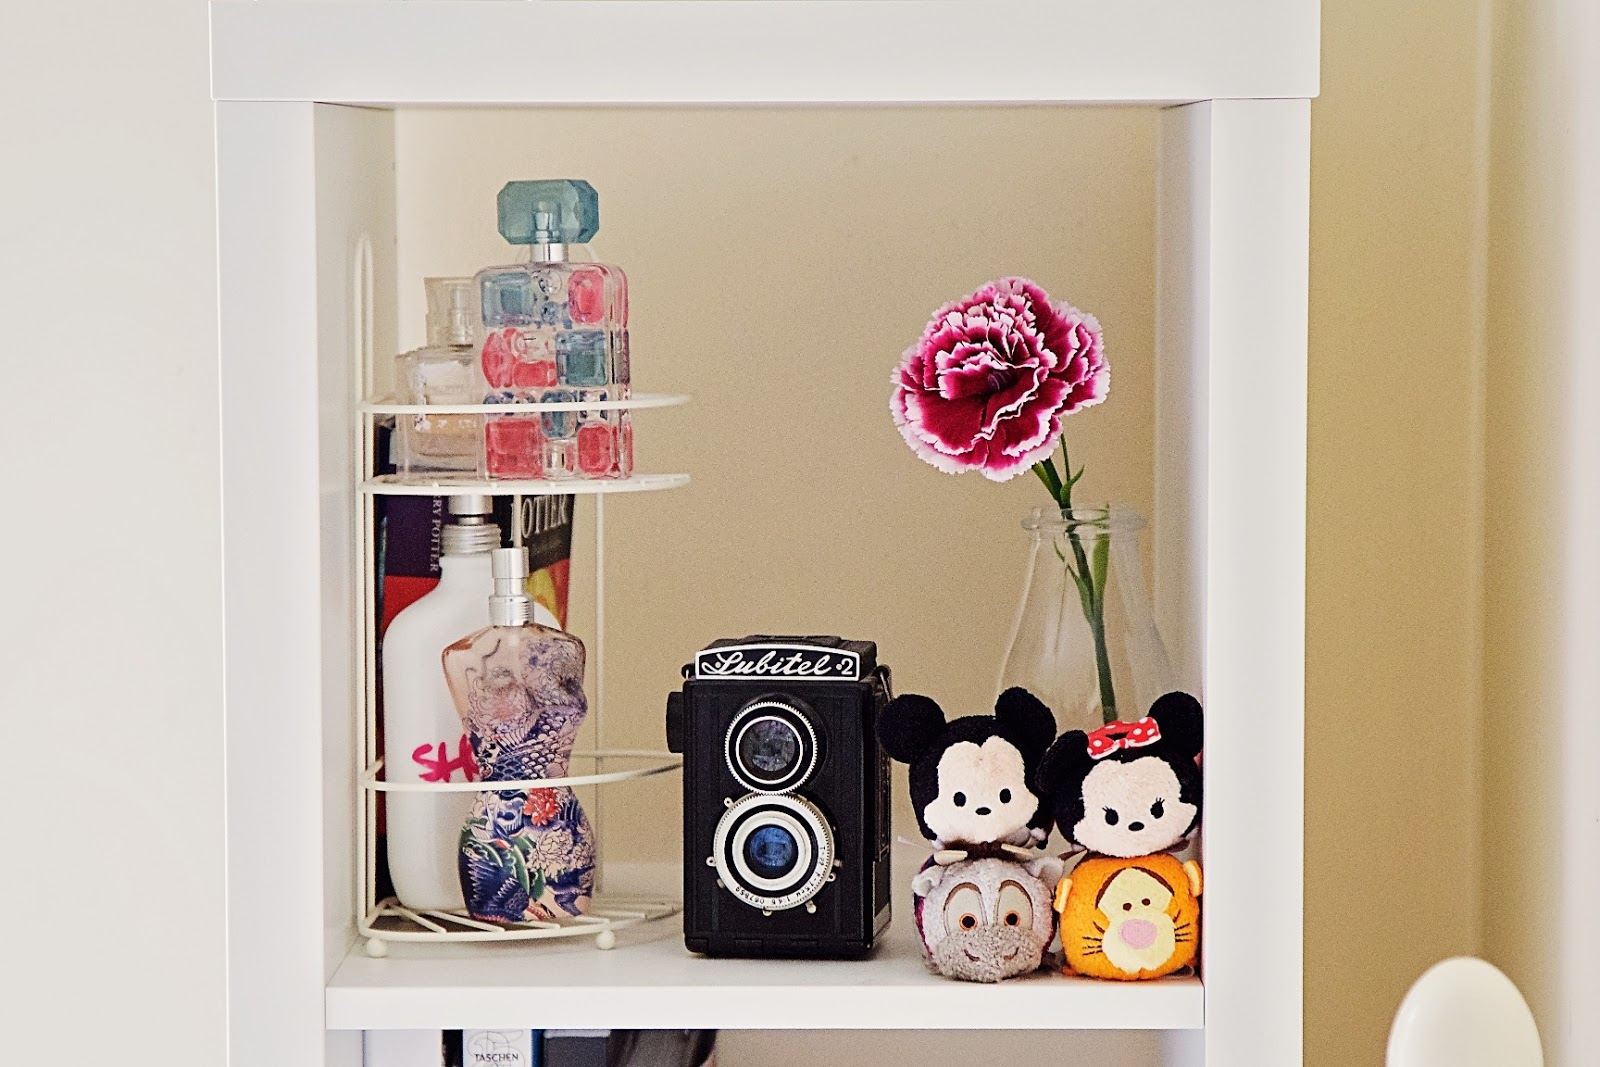 Disney Tsum Tsums displayed on a shelf.